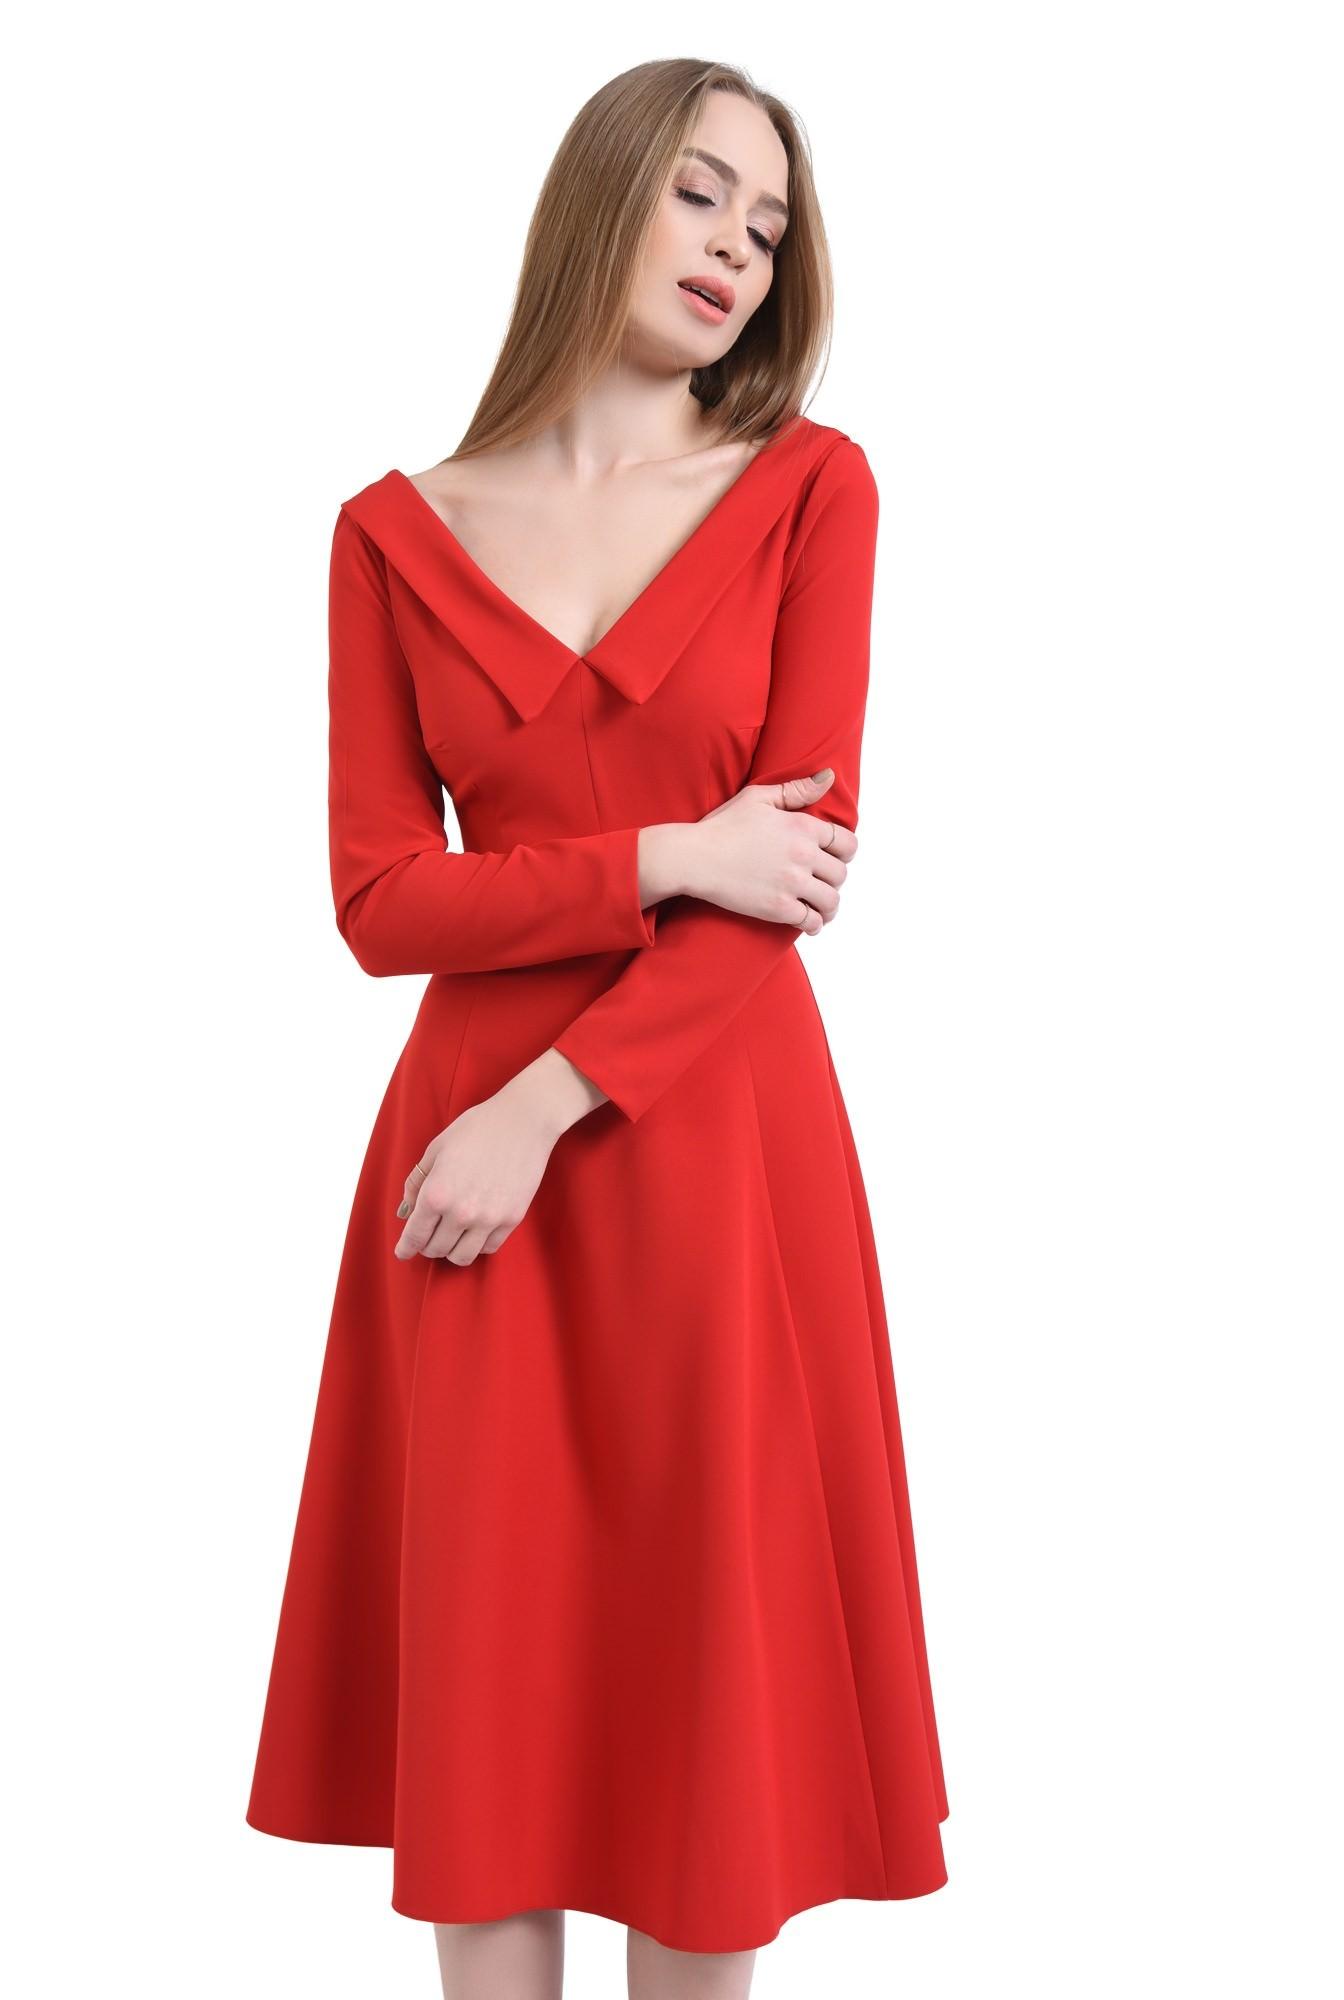 Rochie de zi rosie, cloche